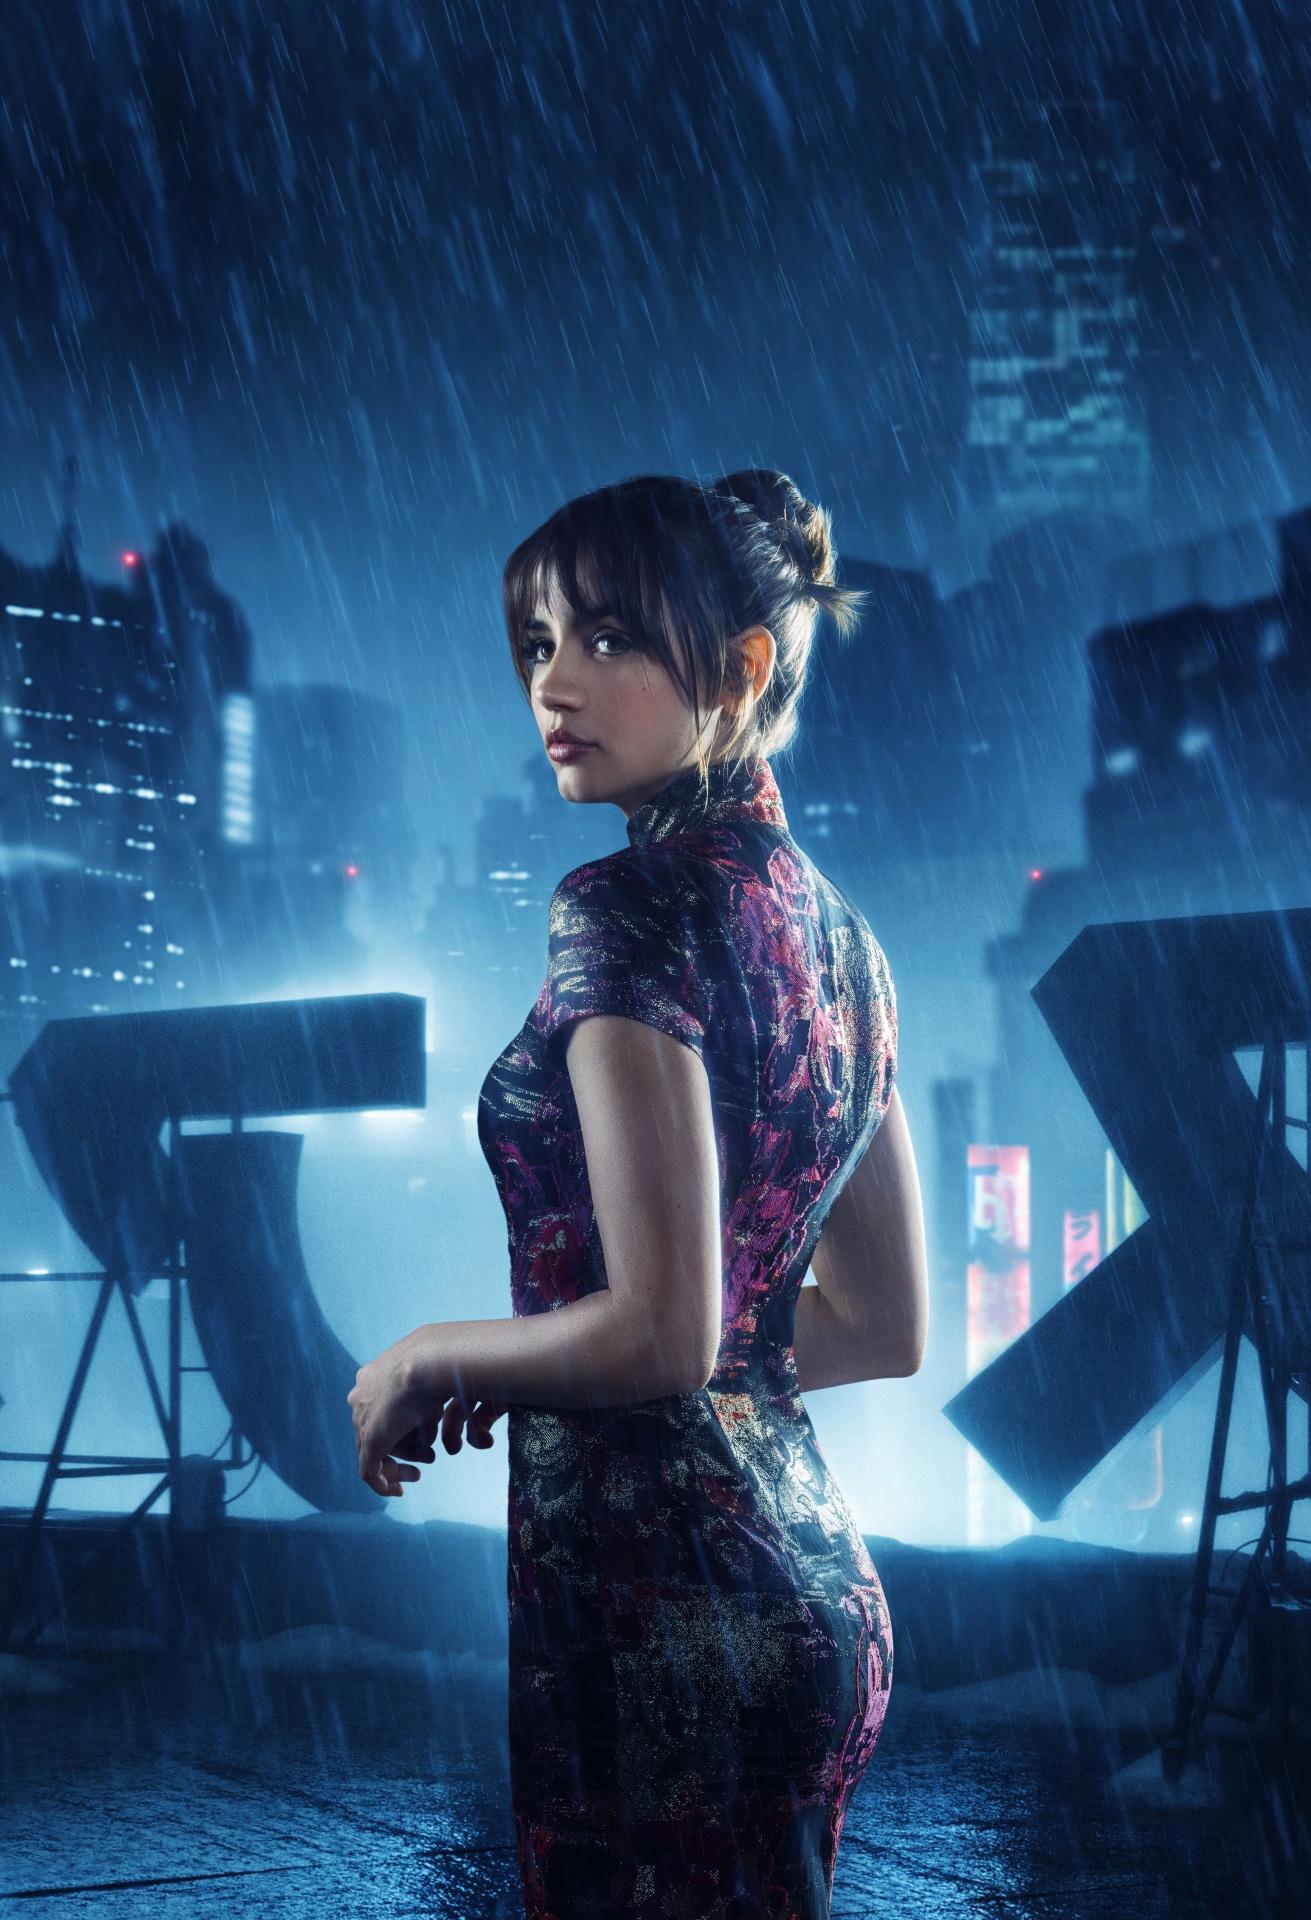 Picture Girls Blade Runner 2049 Movies Rain Ana De Armas 1311x1920